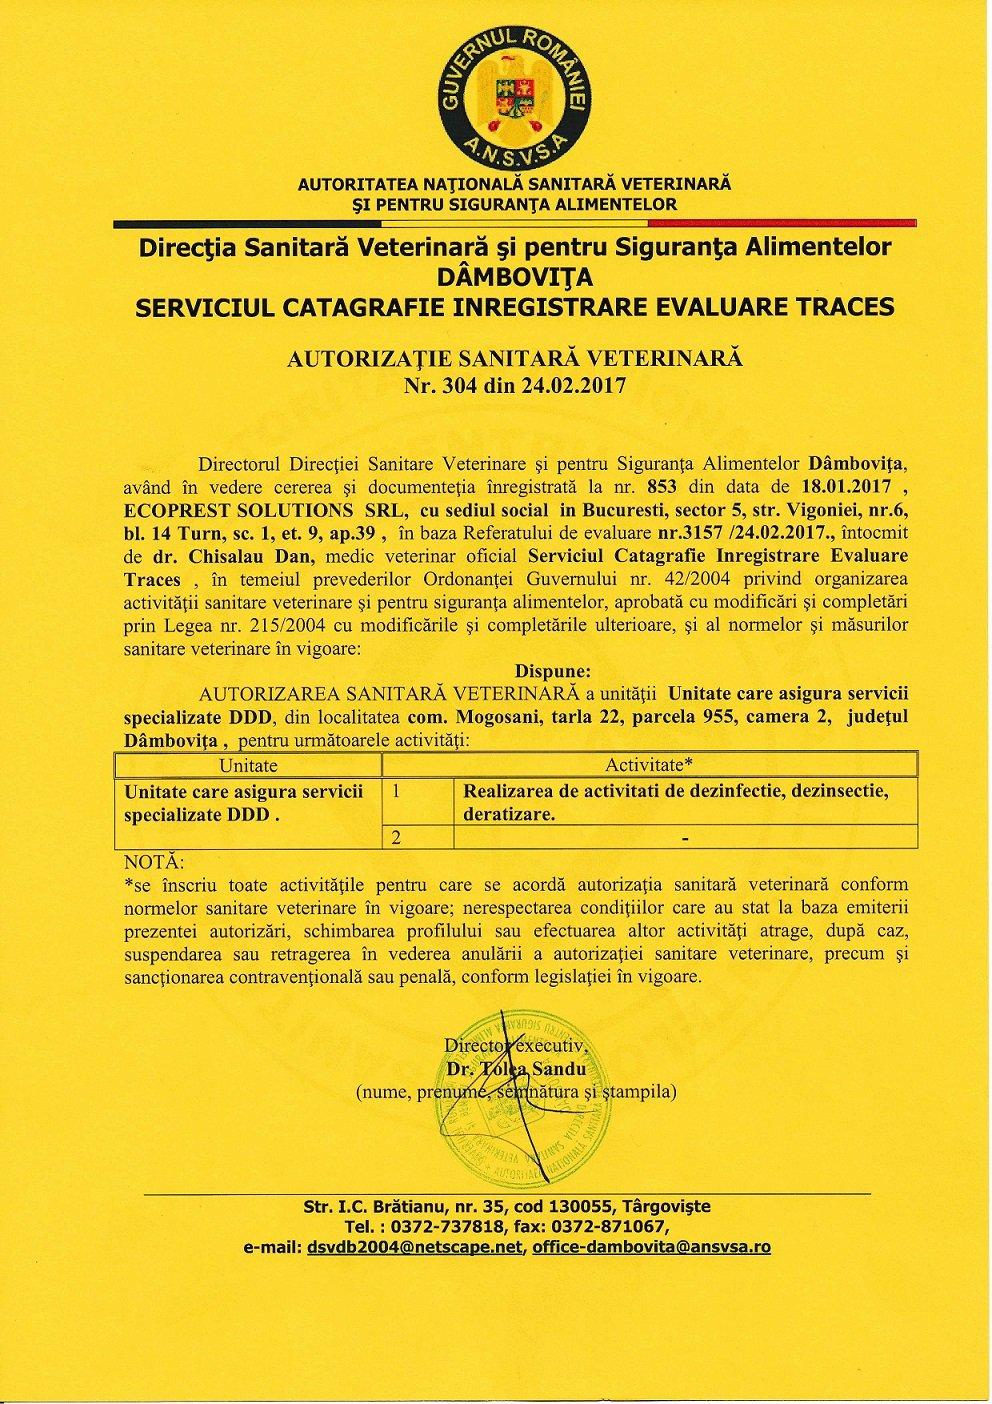 AUTORIZATIE DSV SERVICII DERATIZARE DEZINSECTIE DEZINFECTIE